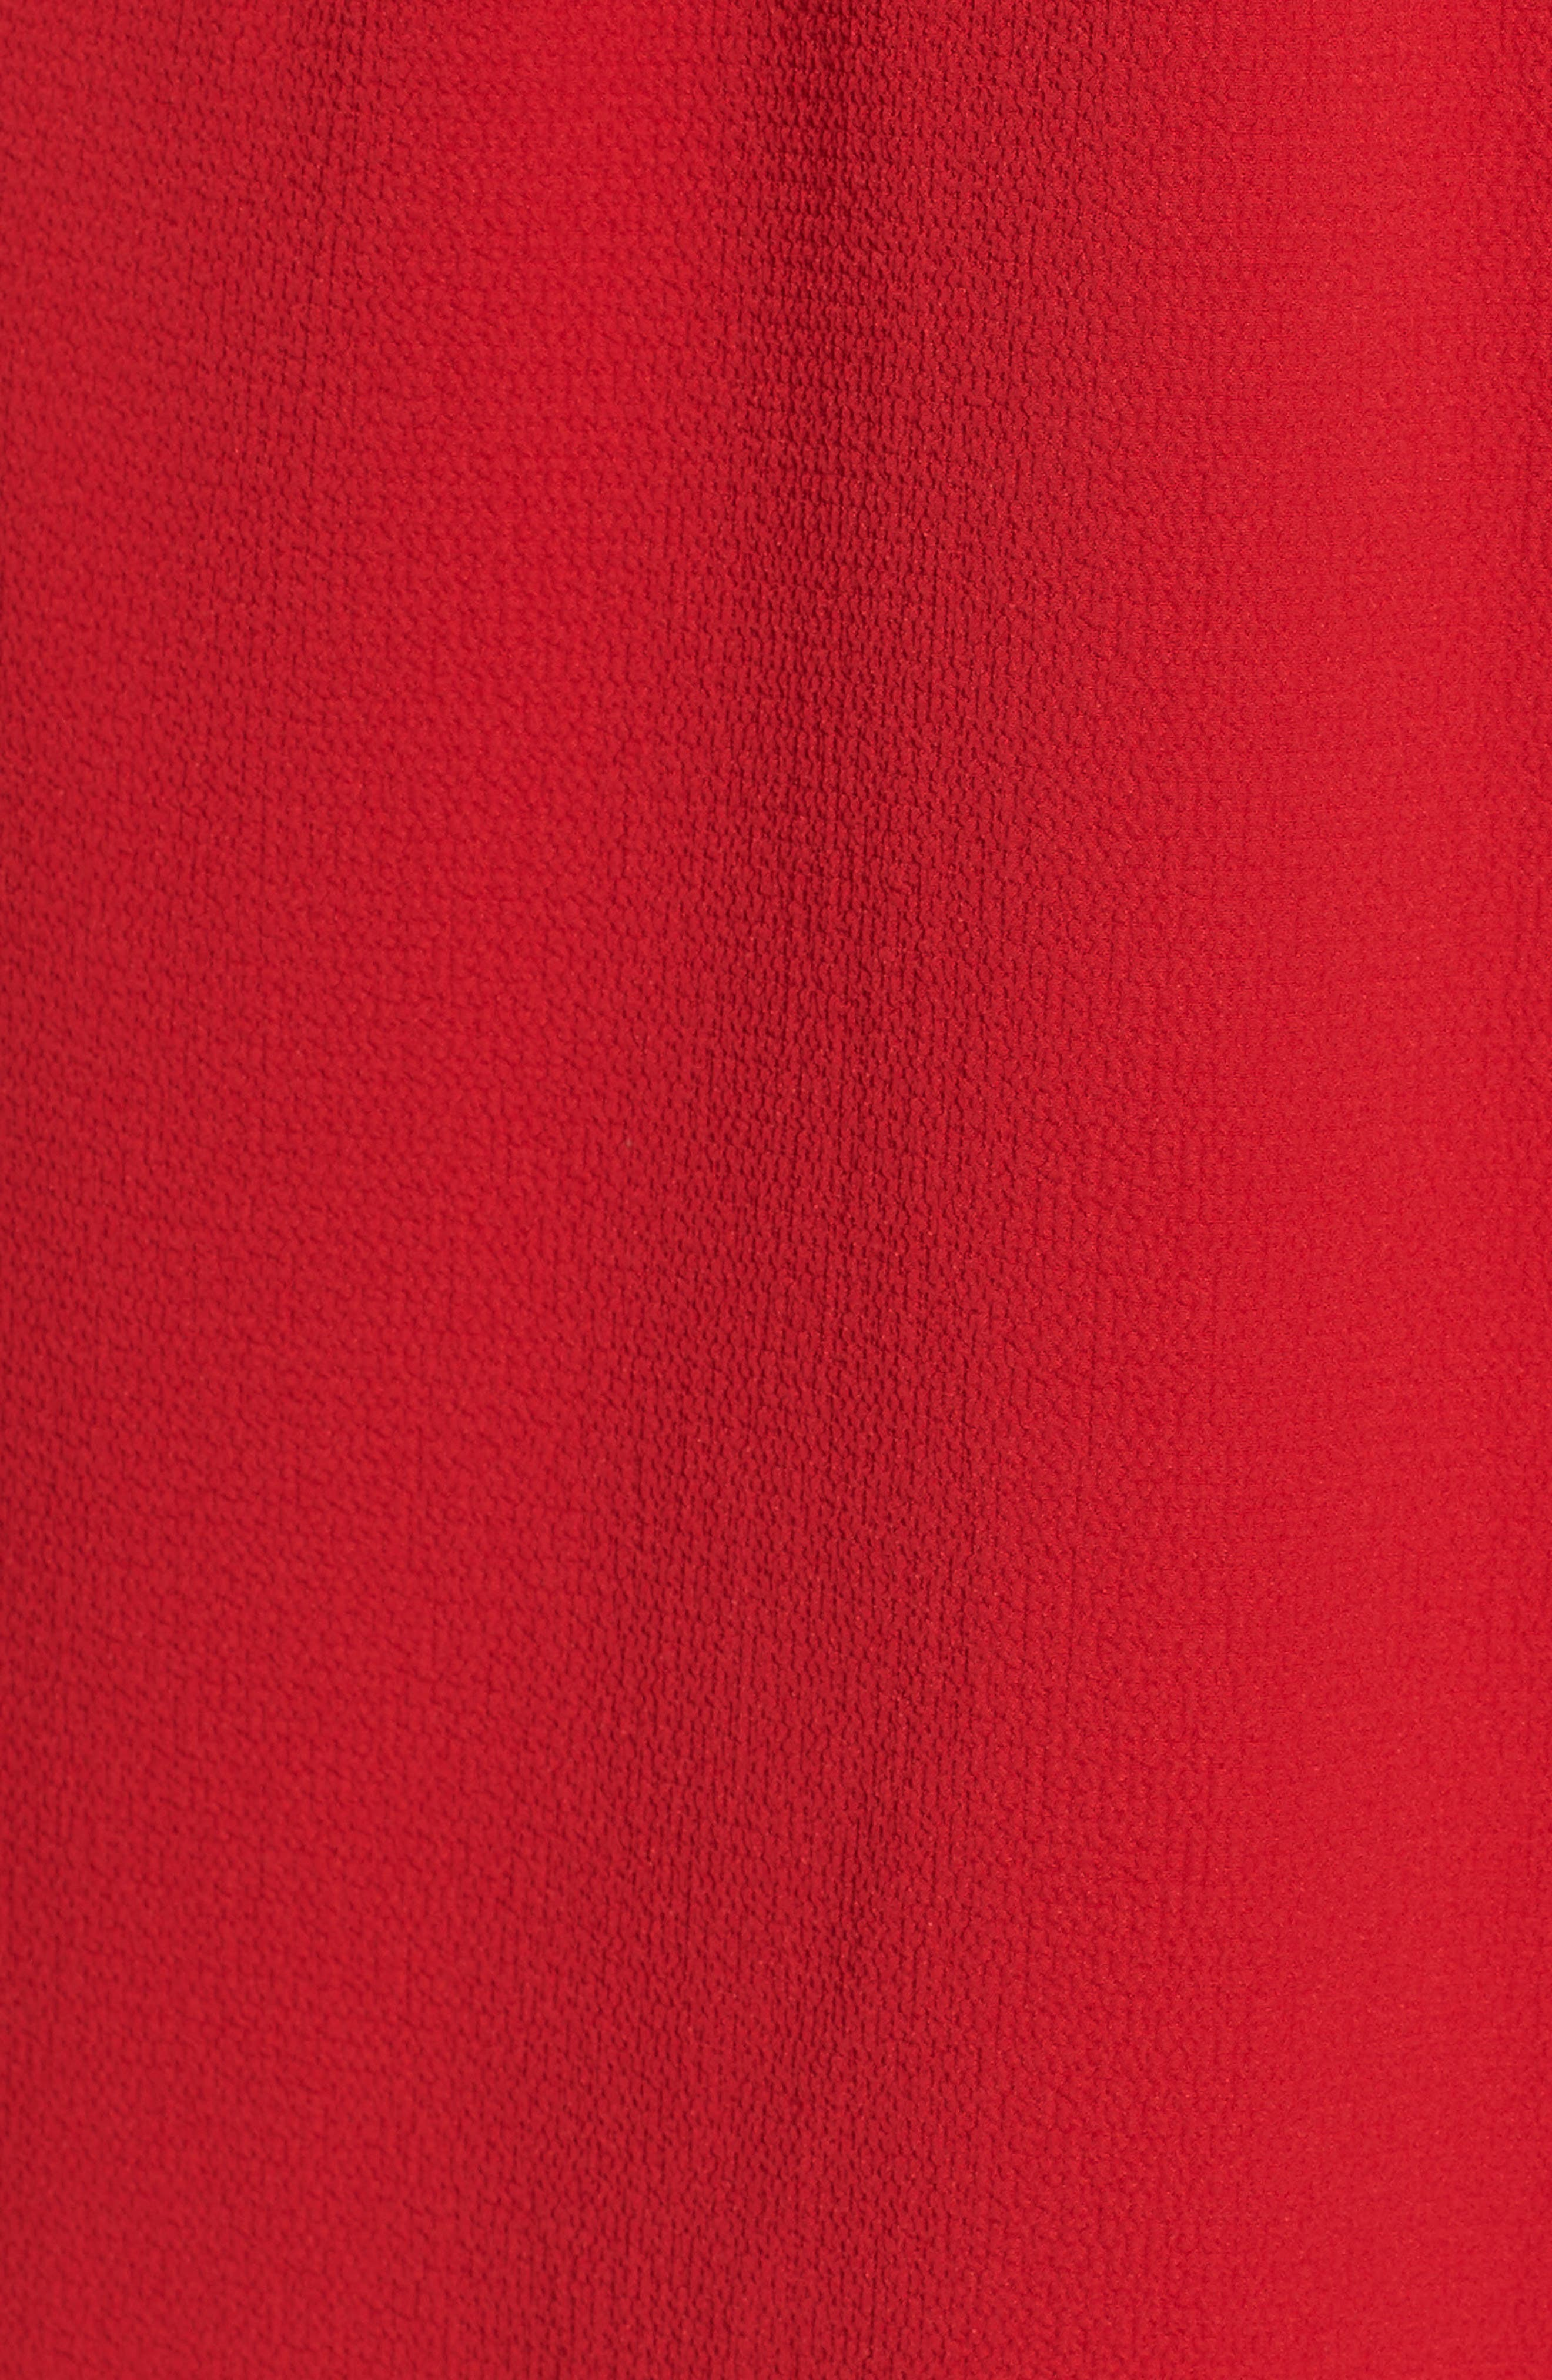 Stretch Crepe Dress,                             Alternate thumbnail 25, color,